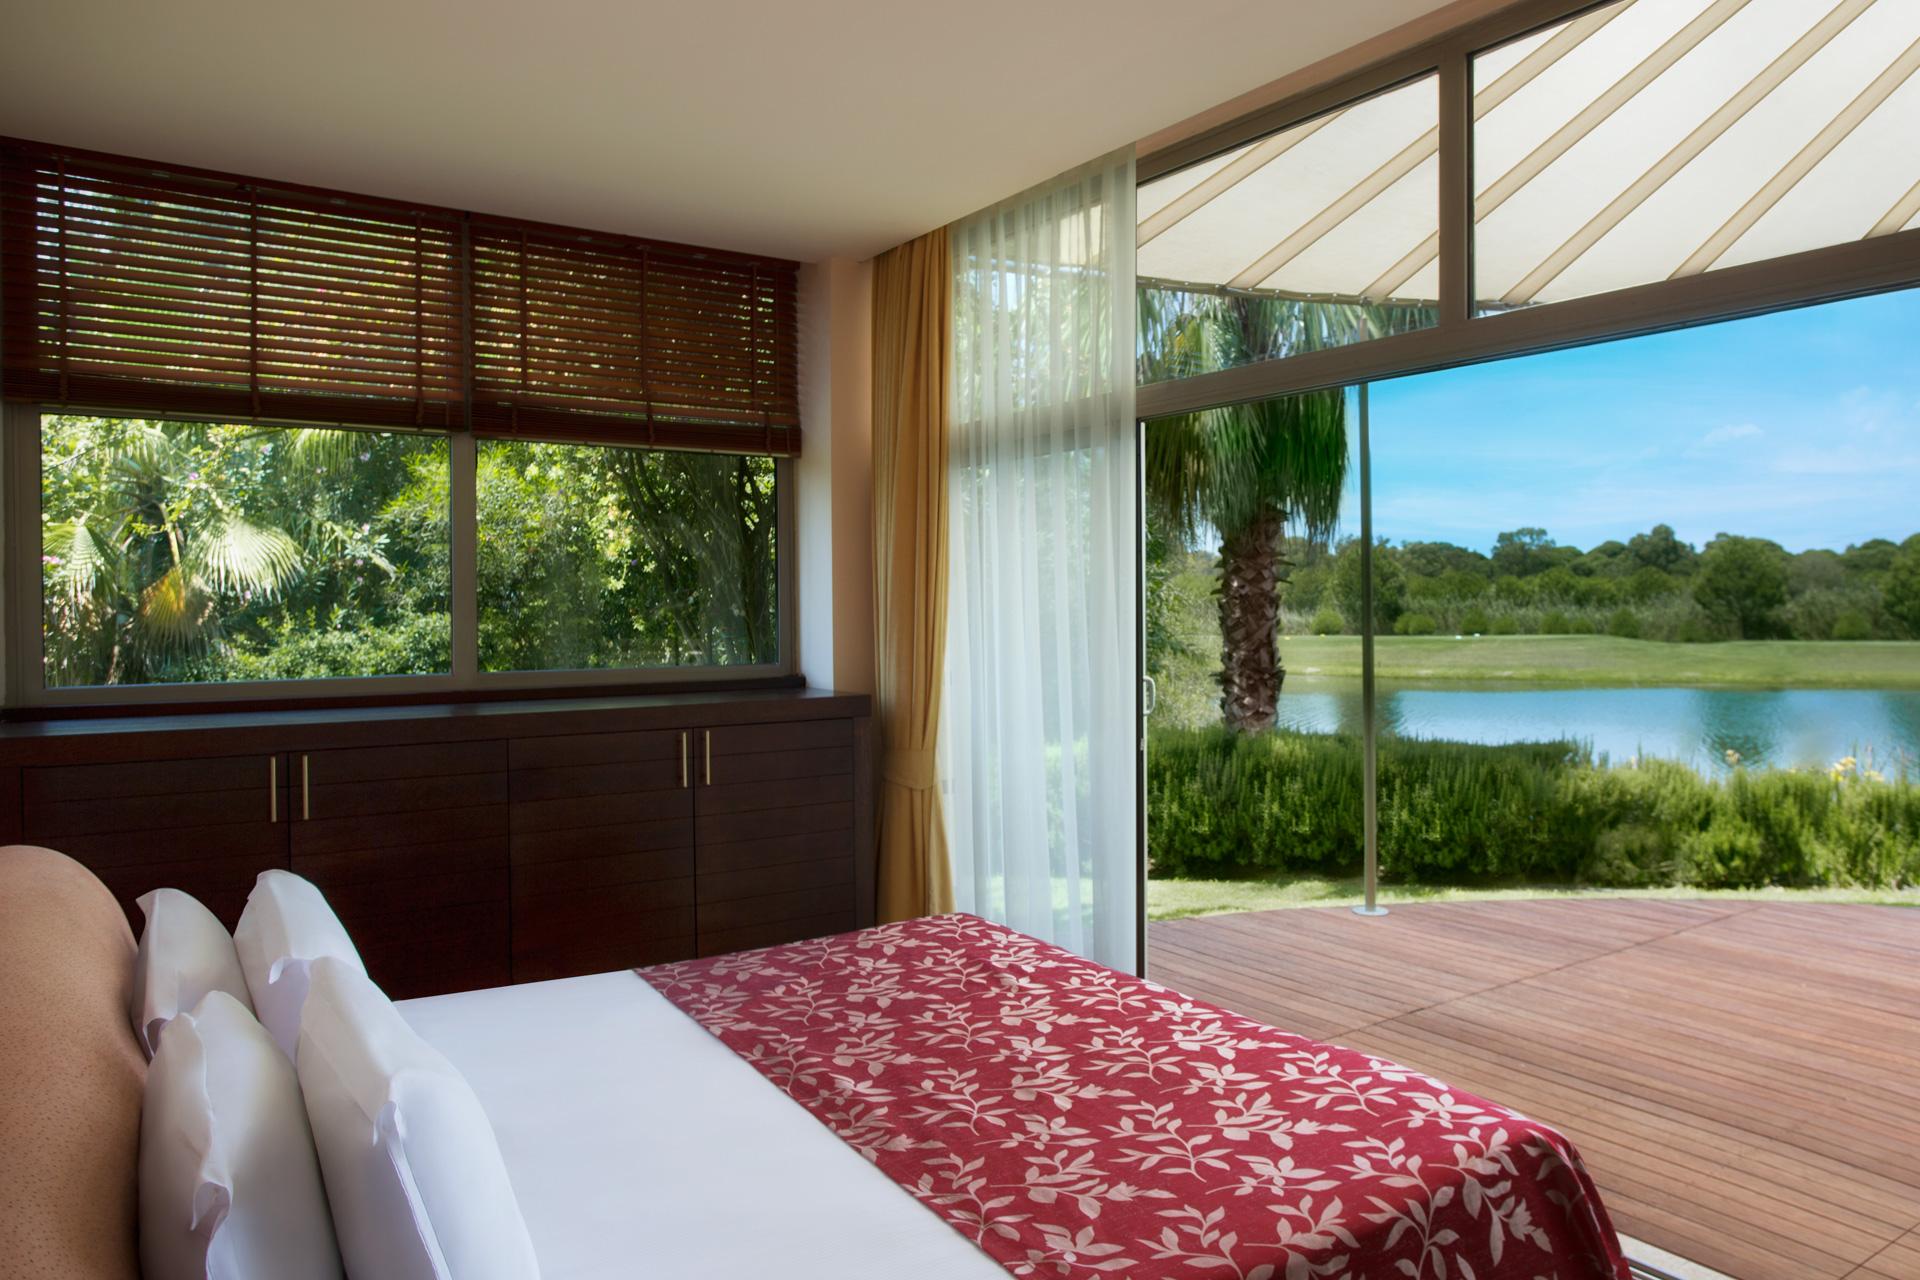 Kempinski Hotel The Dome | Presidential Villa Guest Room